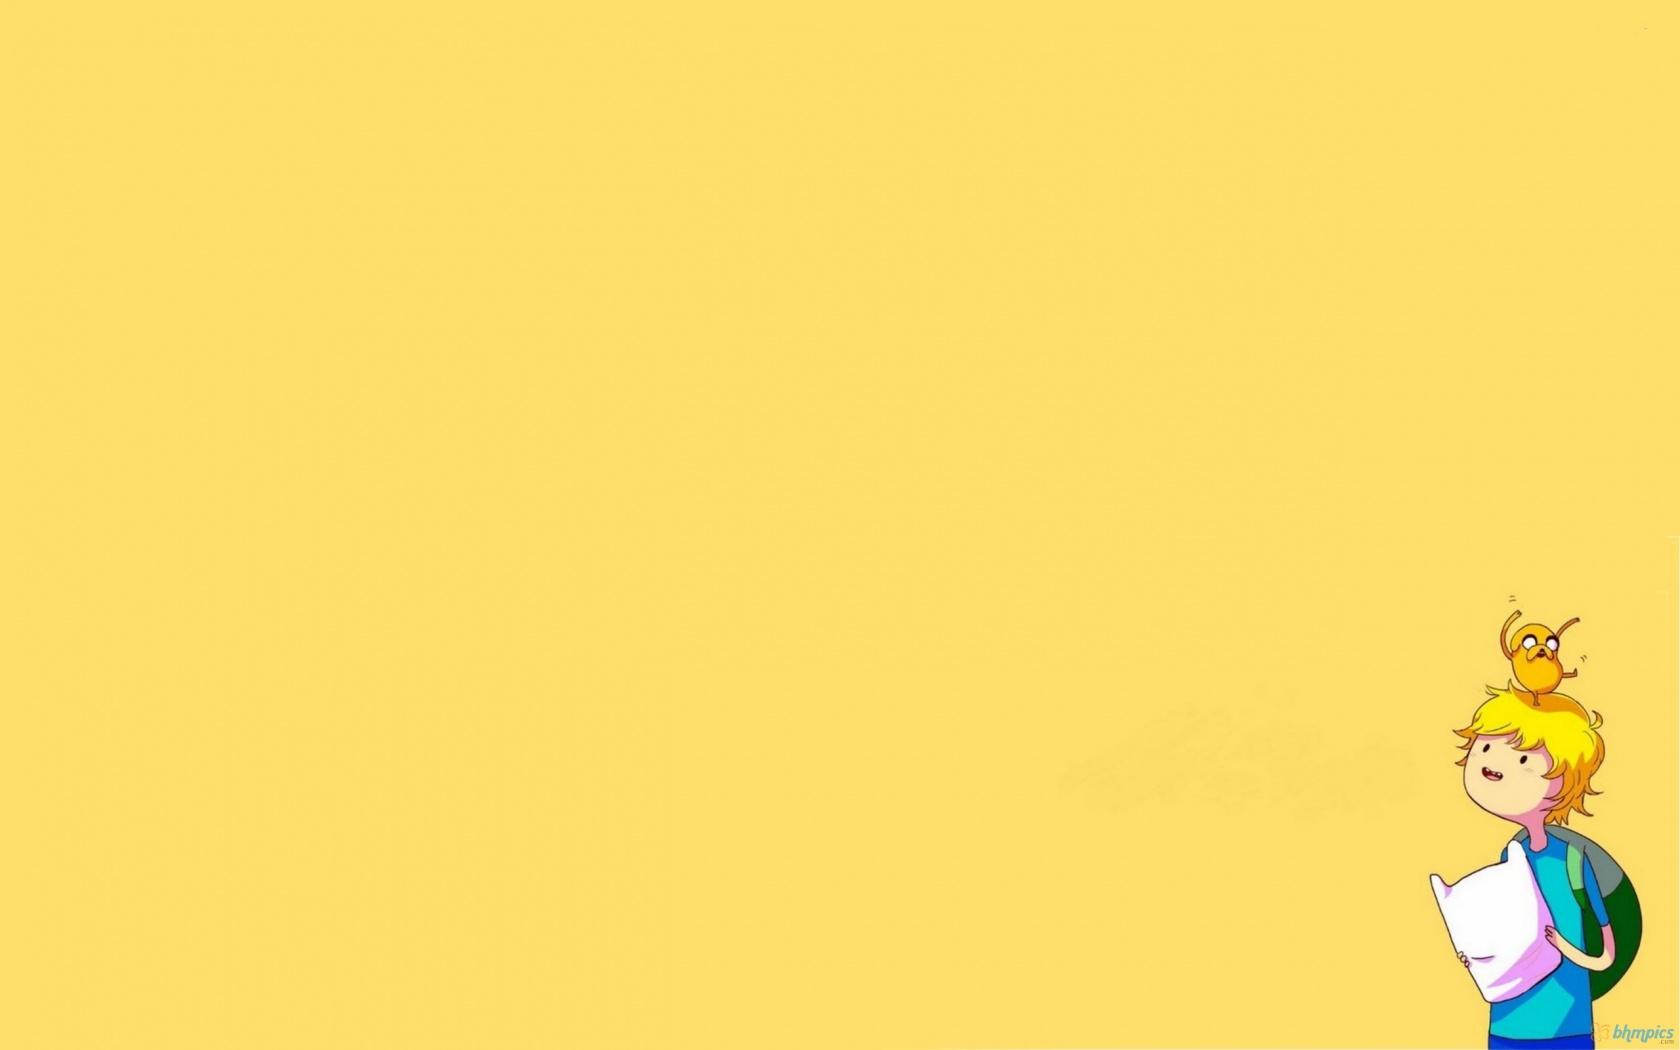 finn   Adventure Time With Finn and Jake Wallpaper 1680x1050